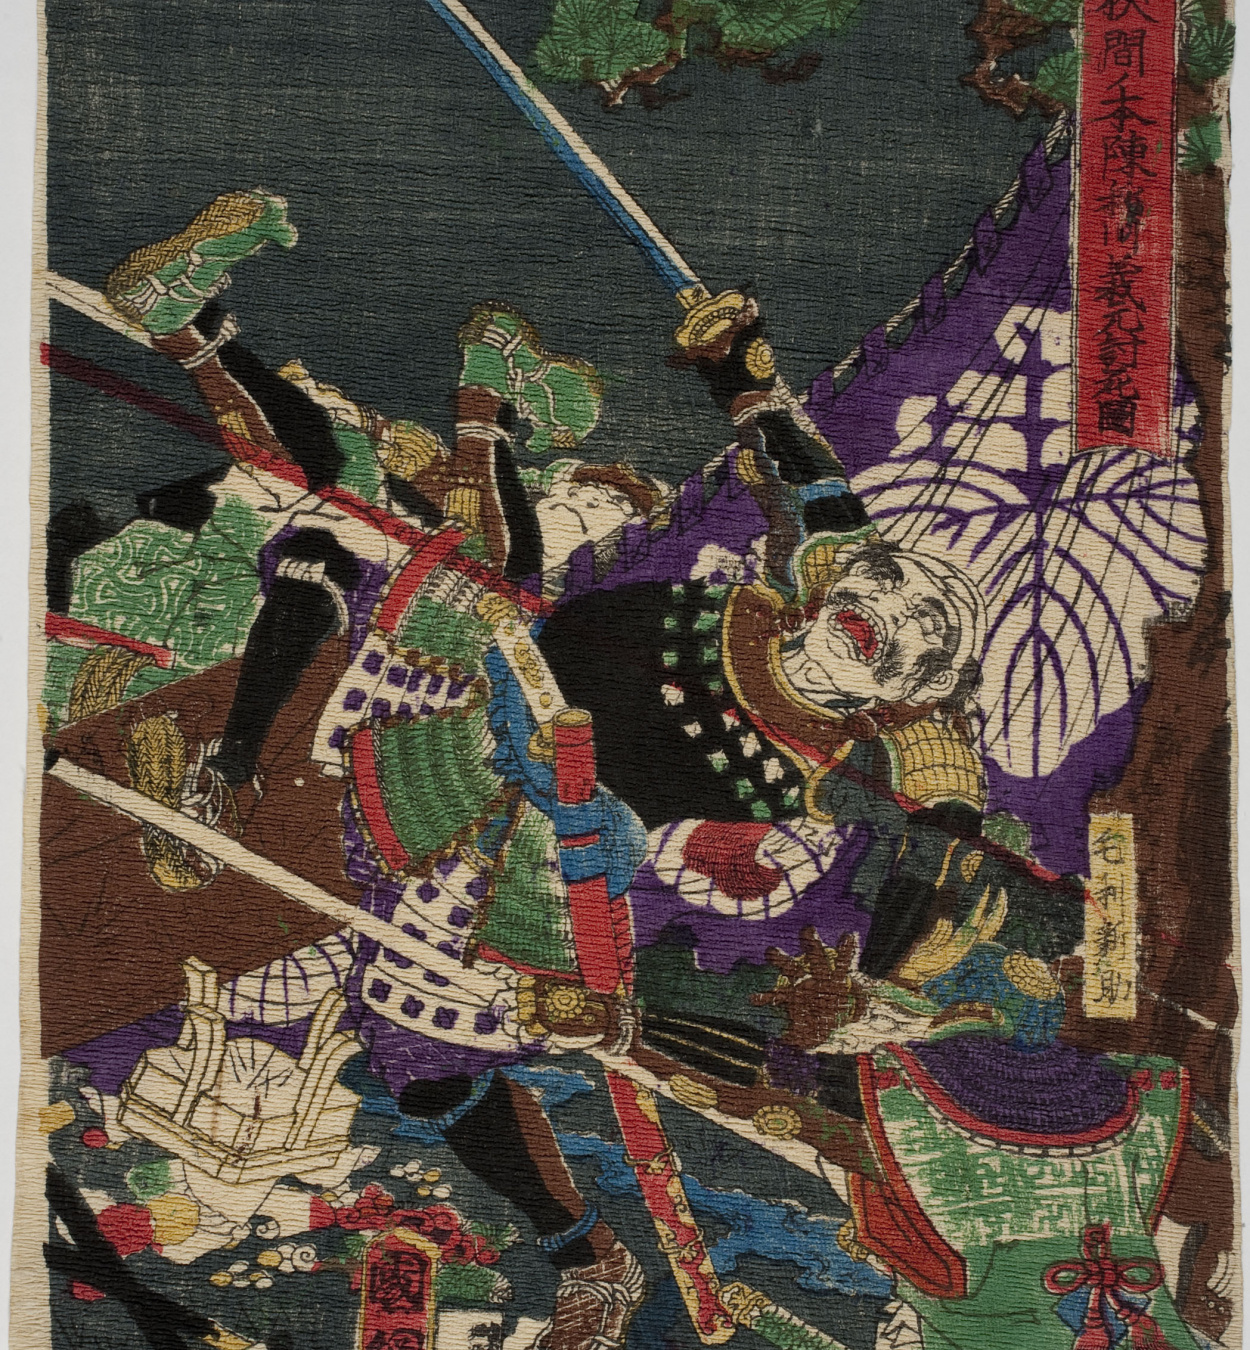 Utagawa Kunitsuna - Death of Imagawa Yoshimoto in the Battle of Okehazama (Okehazama no honjin Imagawa Yoshimoto uchijimi zu) - Circa 1840-1868